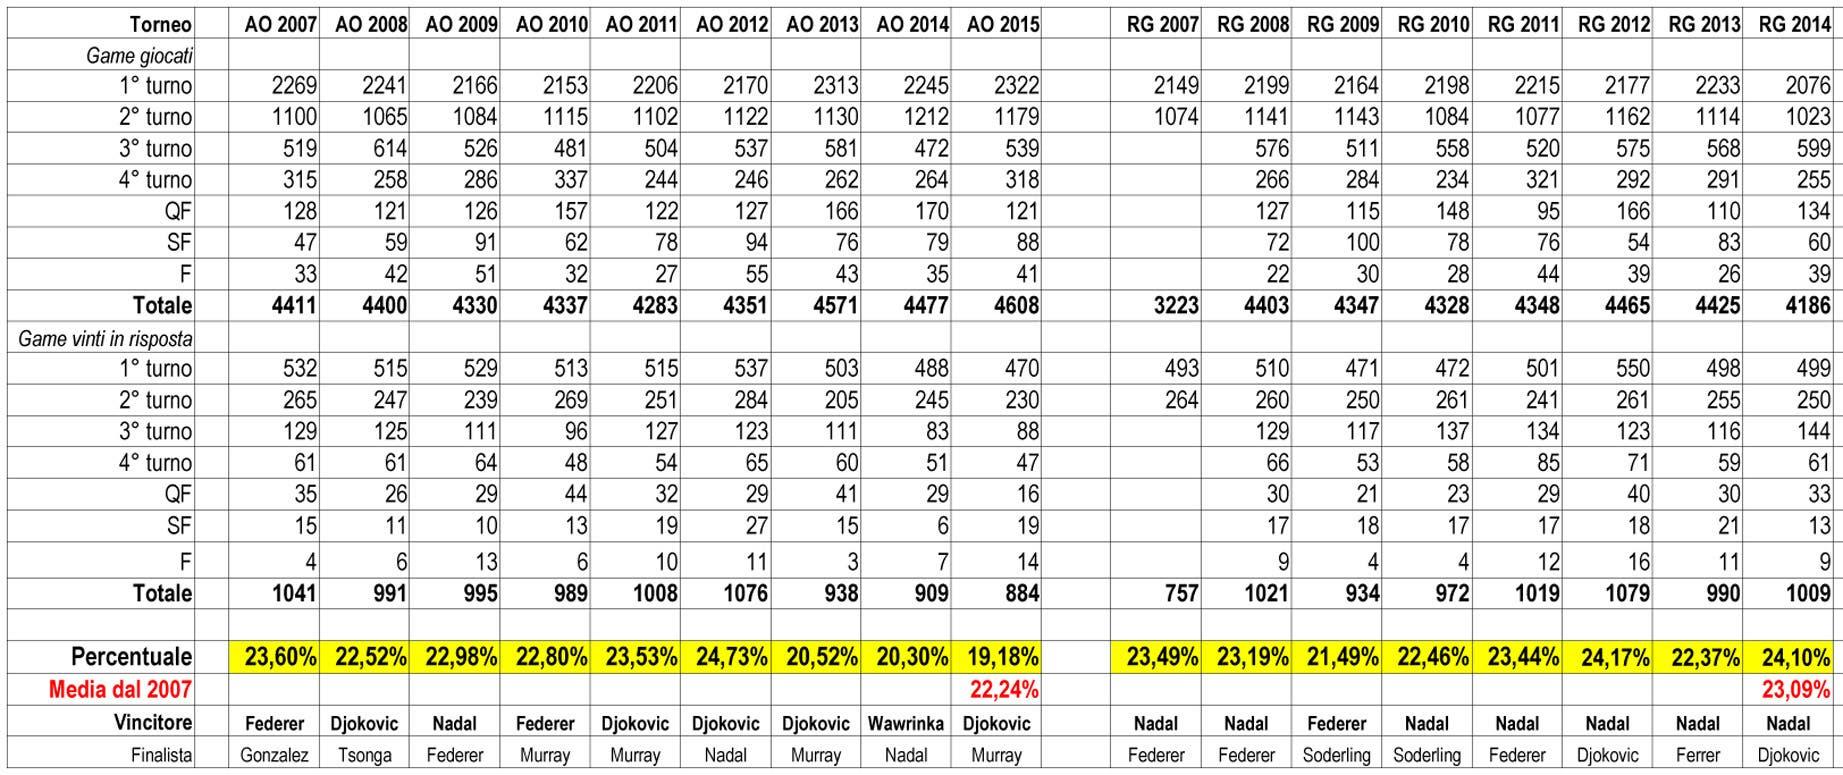 Slam 2007 - 2015 AO + RG